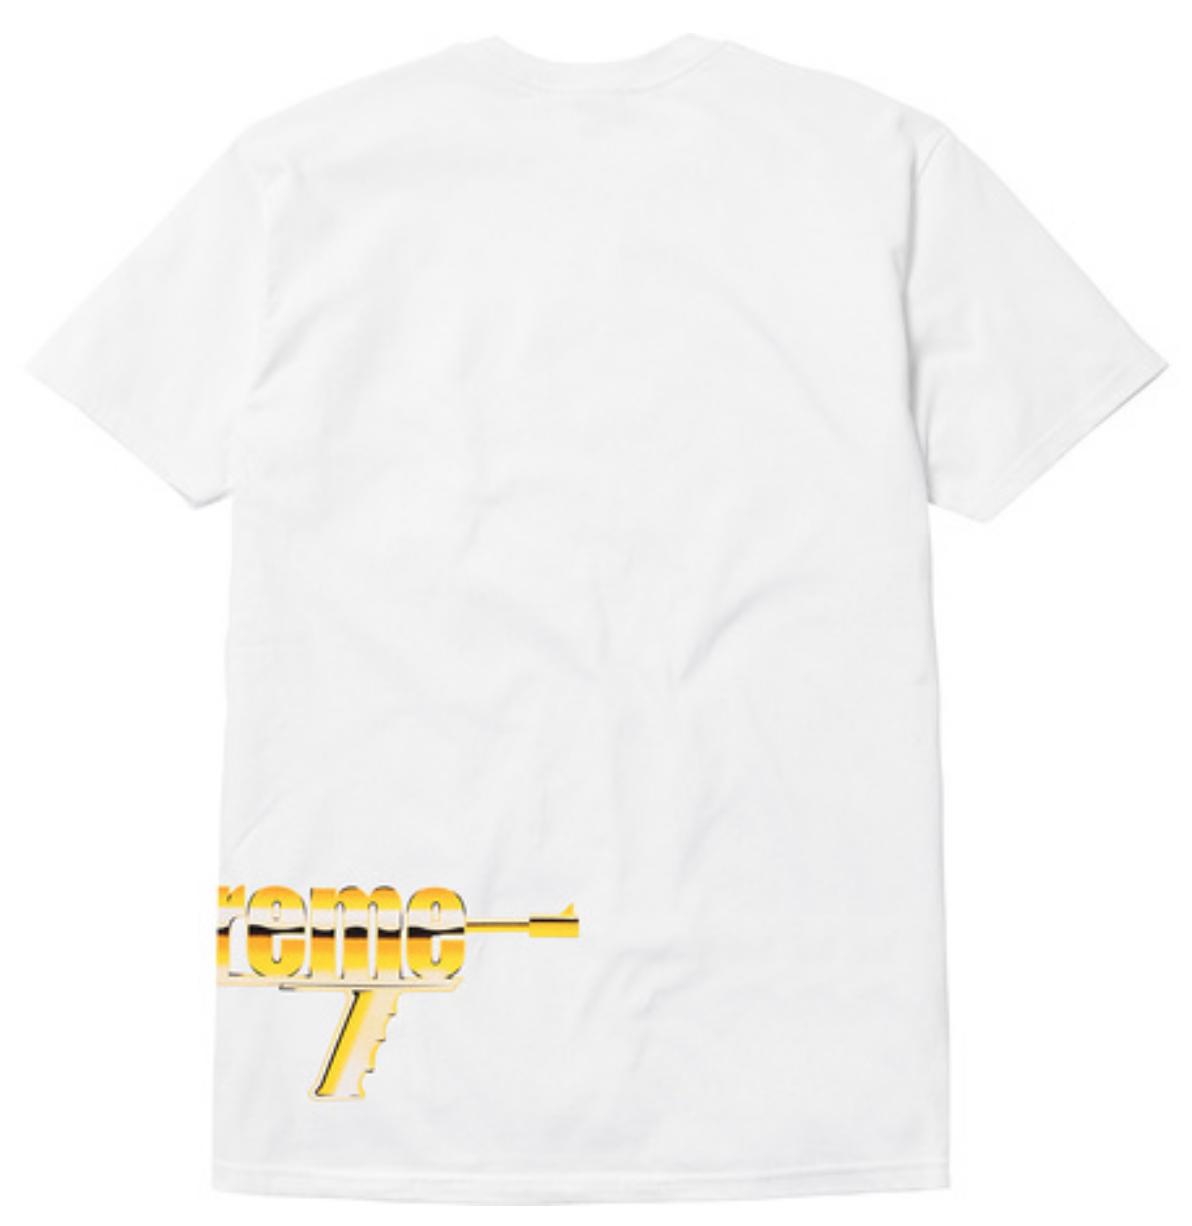 b2912f325ccb Supreme SS17 Automatic Tee Gun Box Logo T-Shirt MADONNA MONA LISA ROCKS  LIQUID S 4 4 of 12 ...